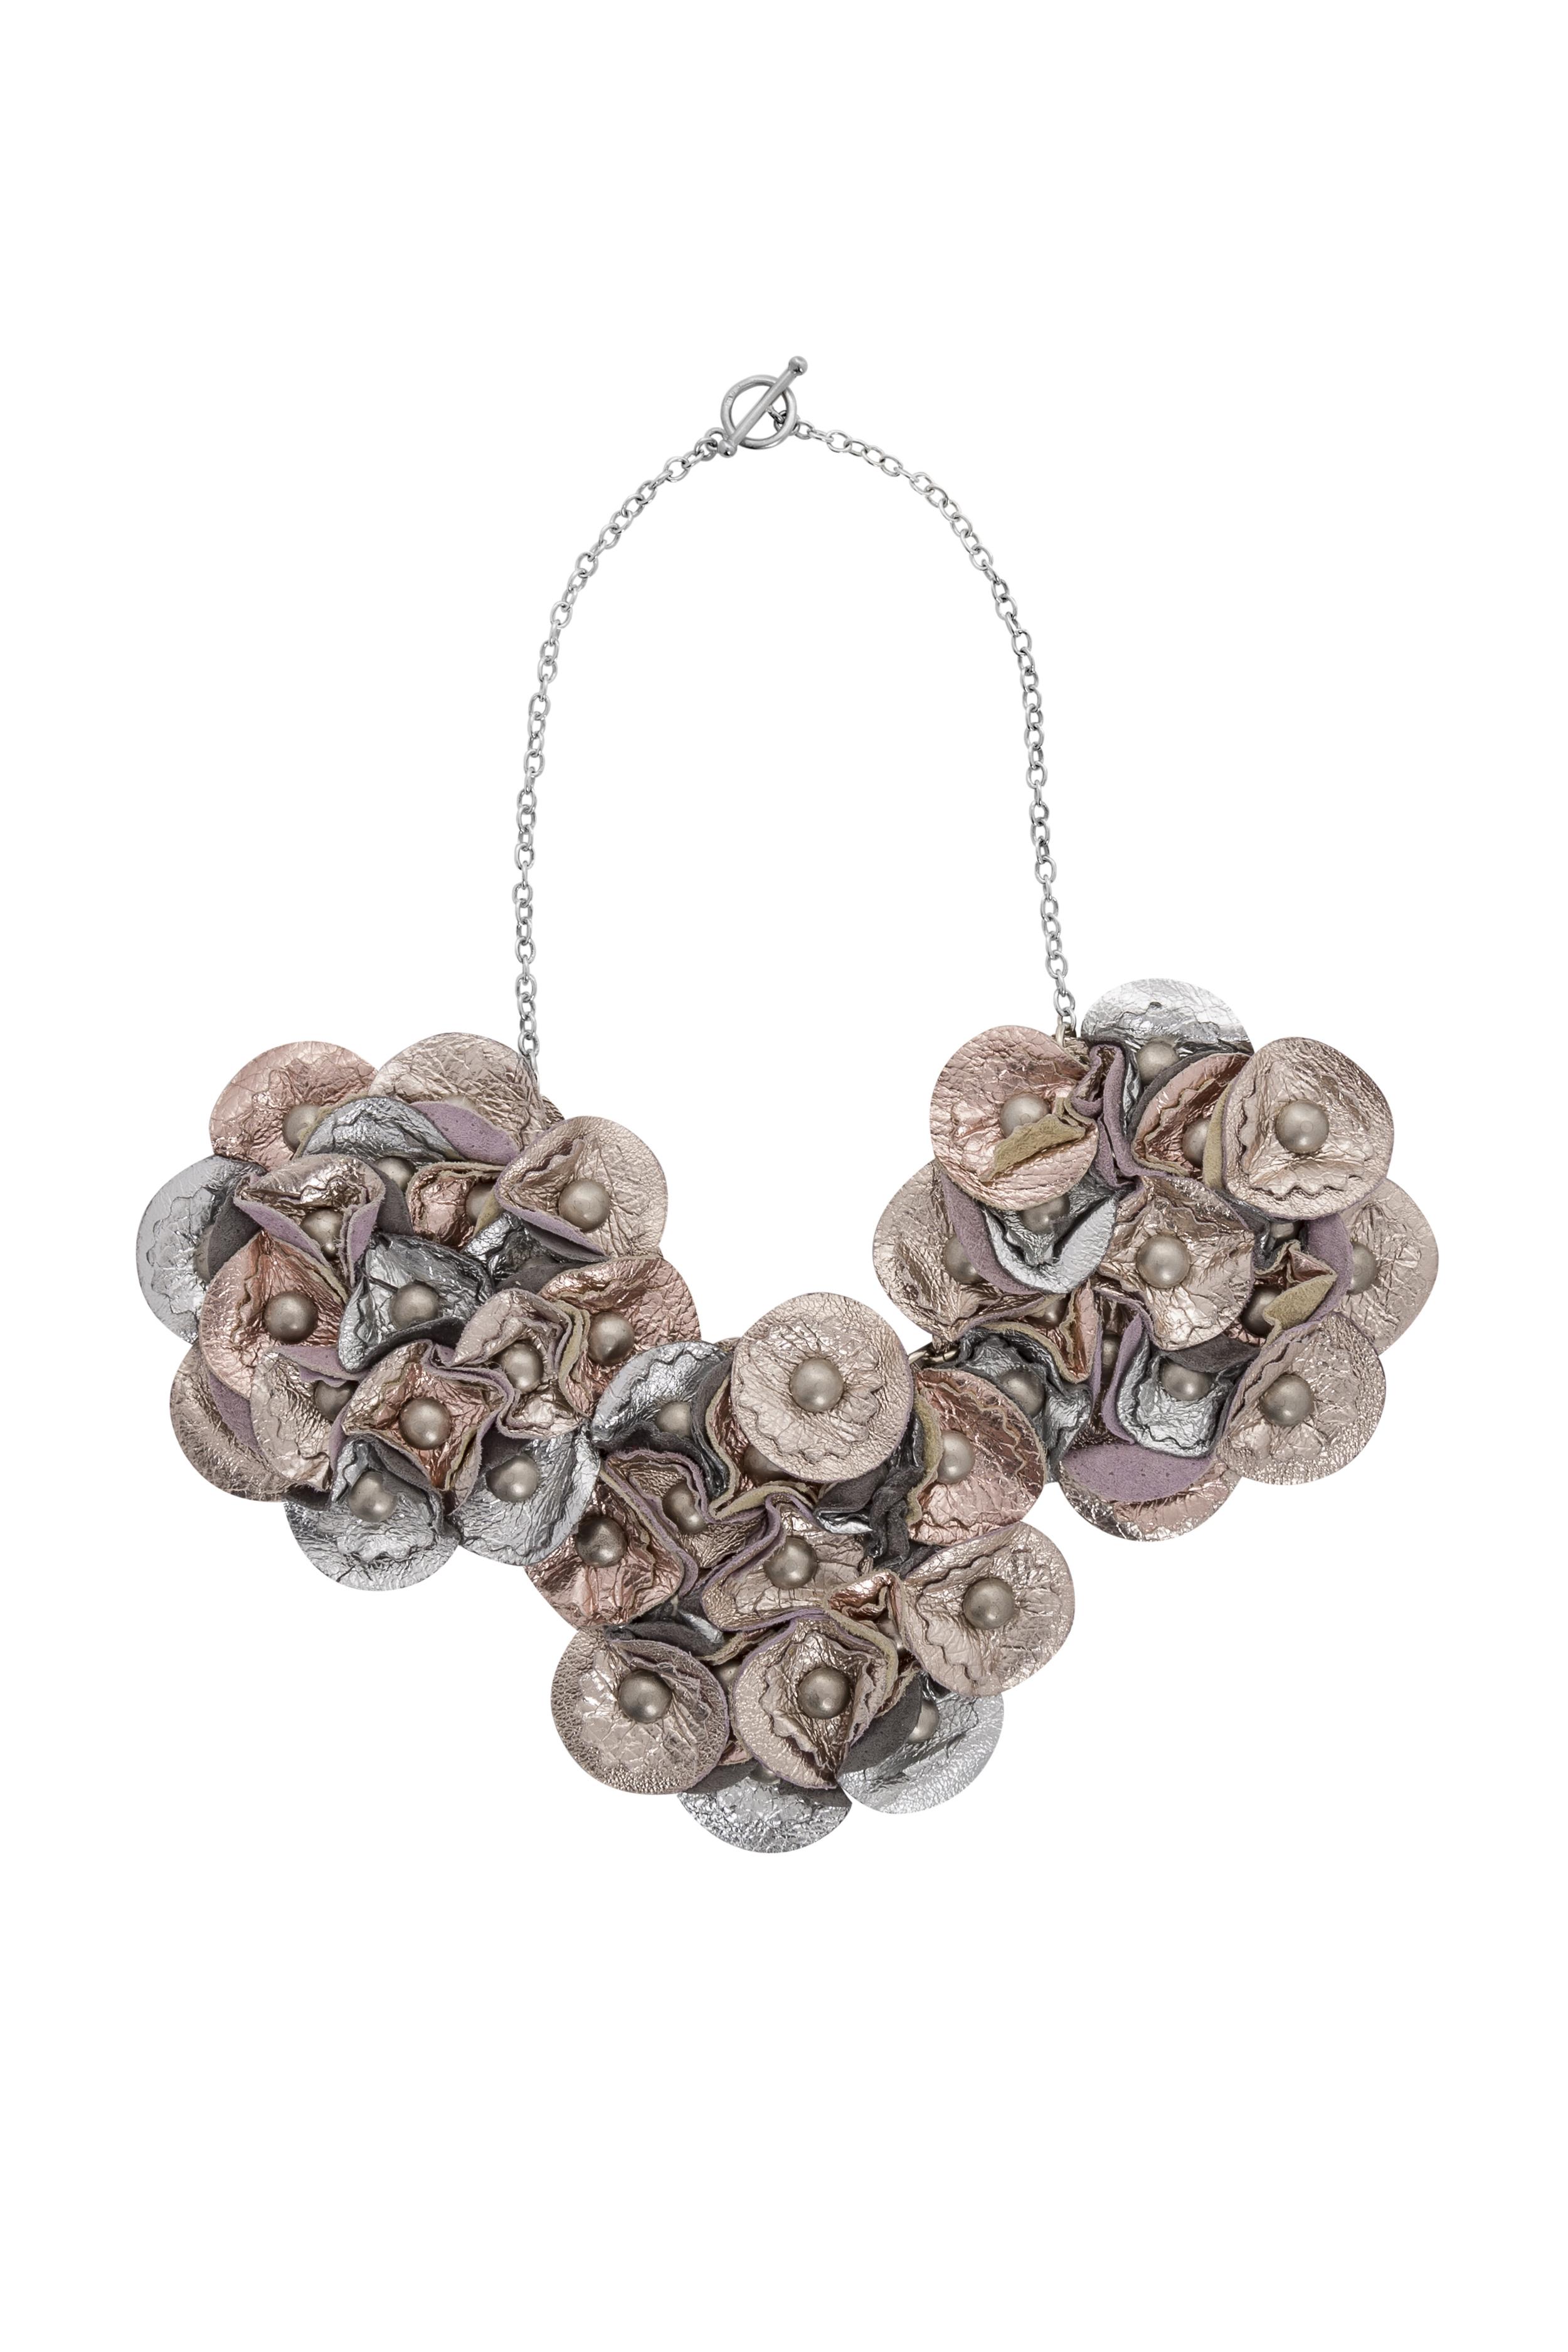 Sian Metallic Necklace /// Champagne